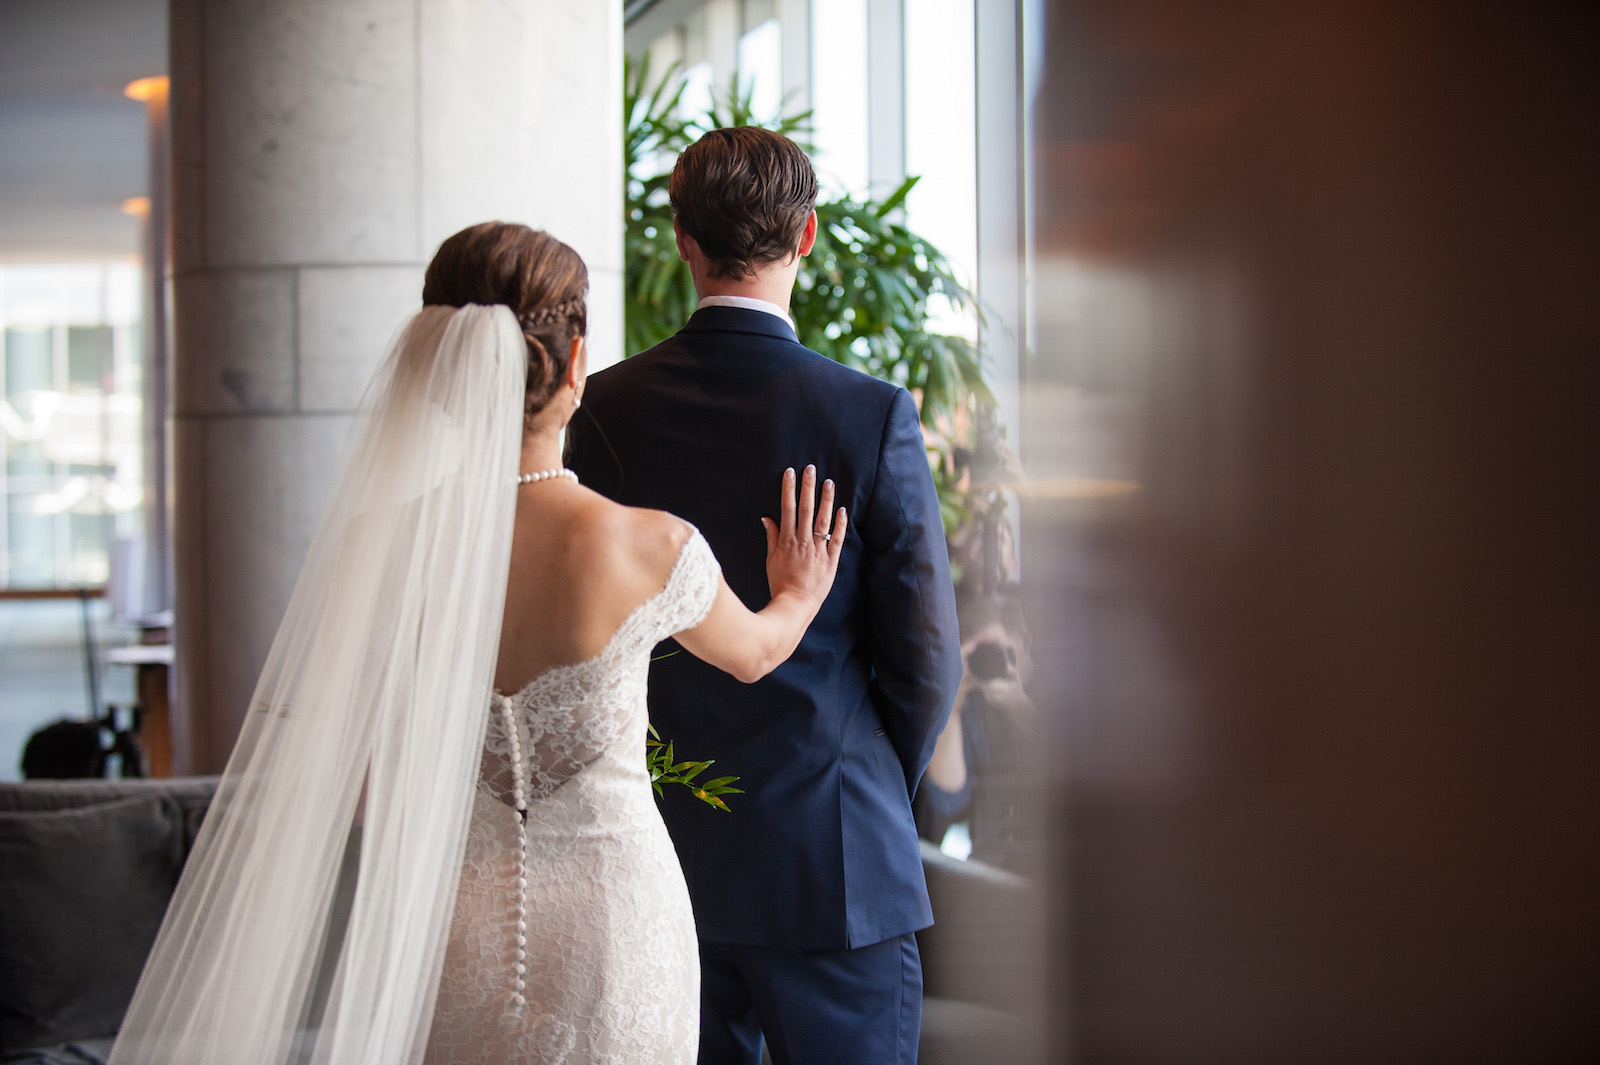 victoria-wedding-photographers-fairmont-pacific-rim-wedding-19.jpg